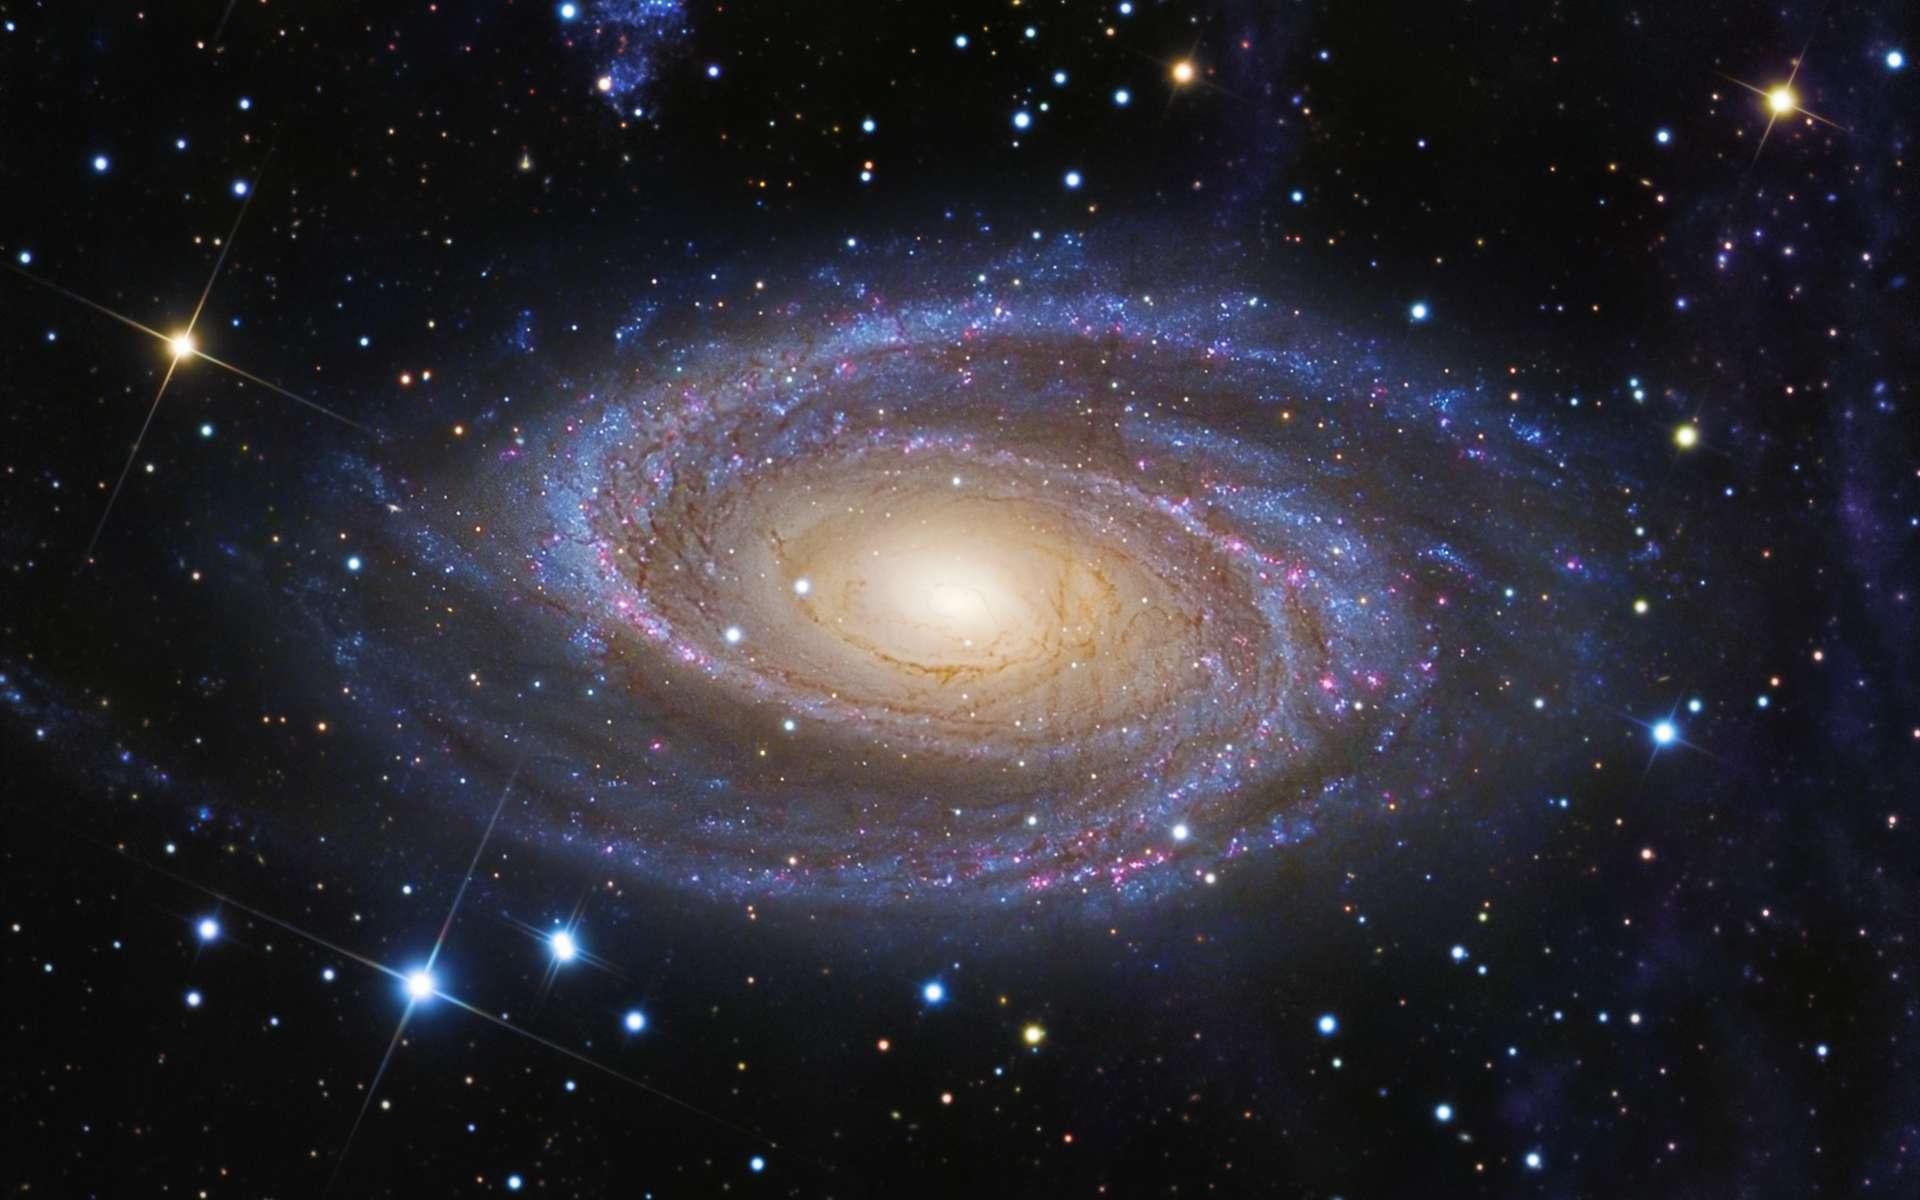 Une photo de la galaxie M81 avec en haut à droite la boucle de Arp. © R. Jay GaBany - Collaboration : A. Sollima (IAC), A. Gil de Paz (U. Complutense Madrid) D. Martínez-Delgado (IAC, MPIA), J.-J. Gallego-Laborda (Fosca Nit Obs.), T. Hallas (Hallas Obs.)